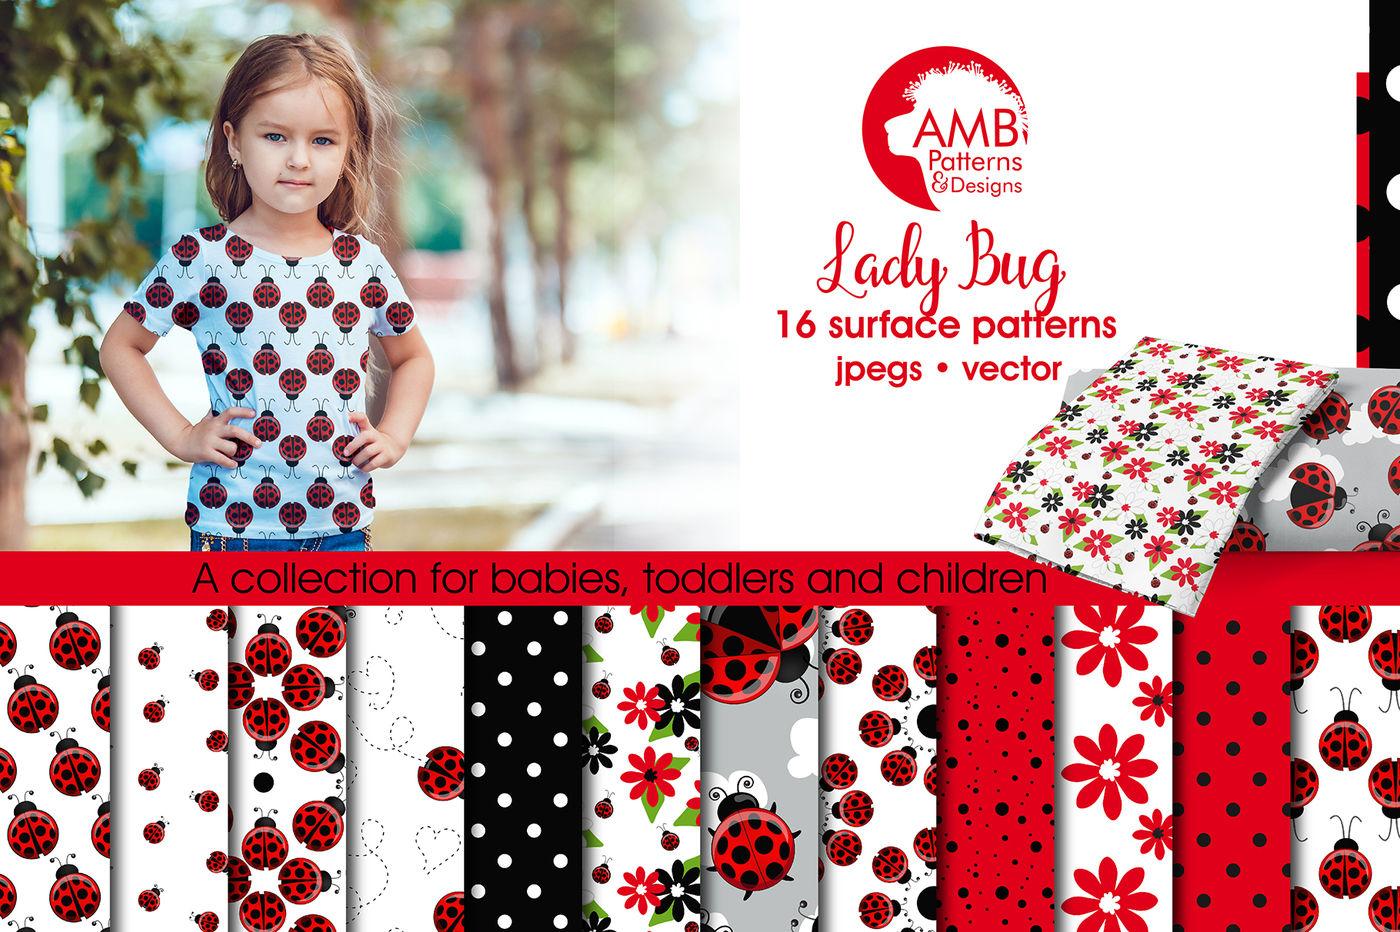 lady bug patterns ladybug papers amb1928